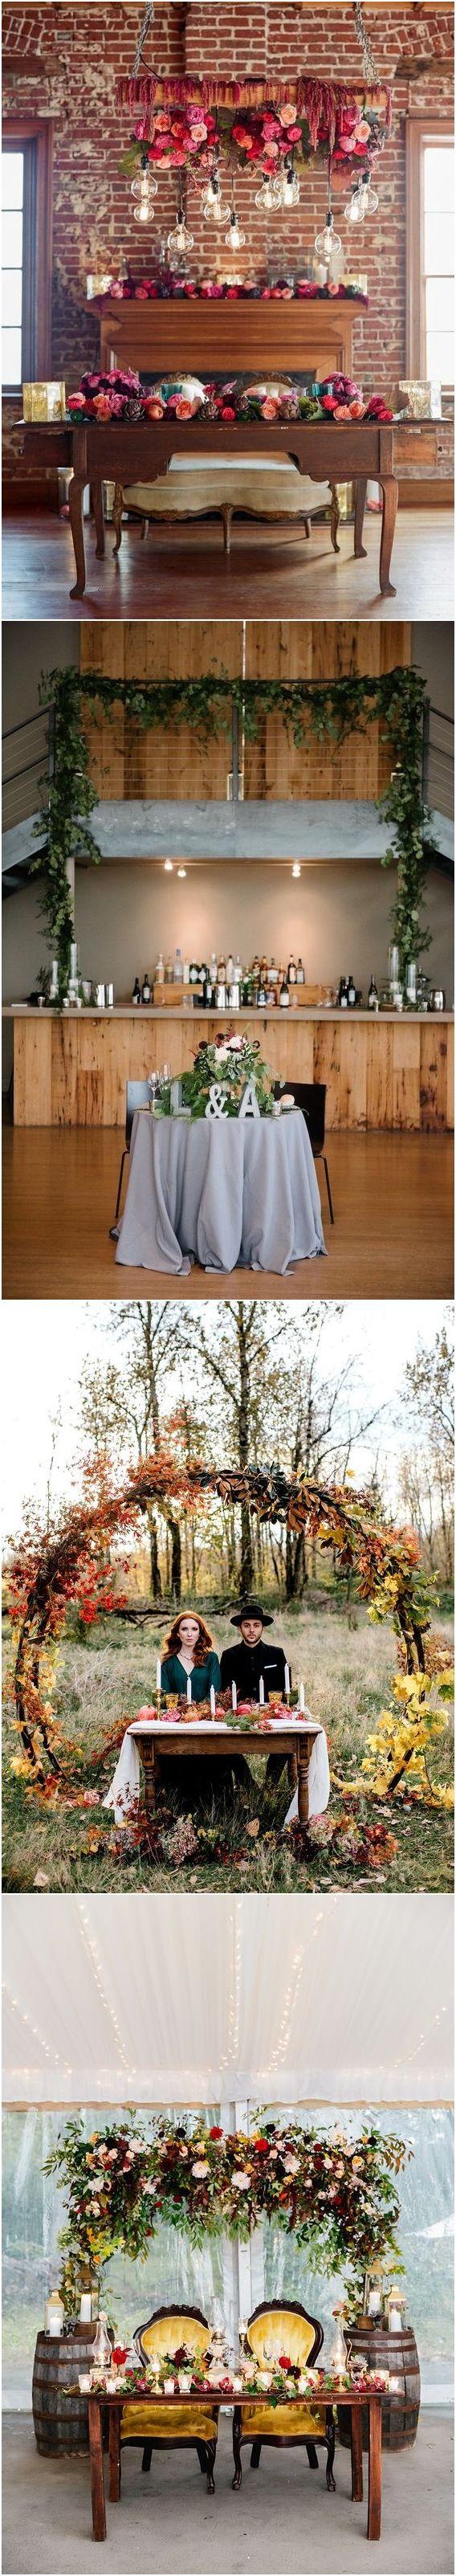 wedding reception at home ideas uk%0A    Fall Wedding Reception  Sweetheart Table Ideas